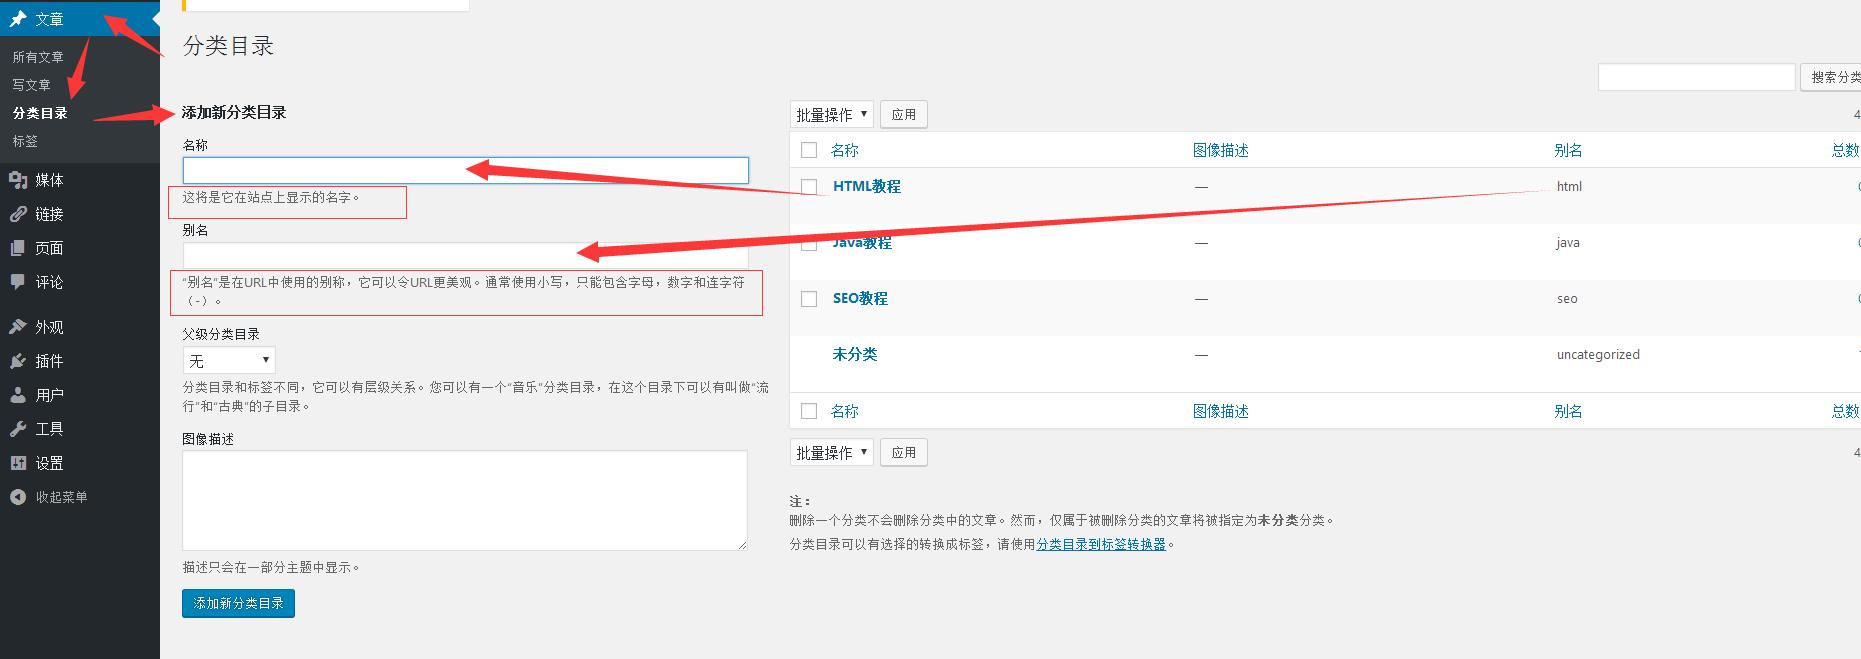 wordpress后台管理系统简单操作